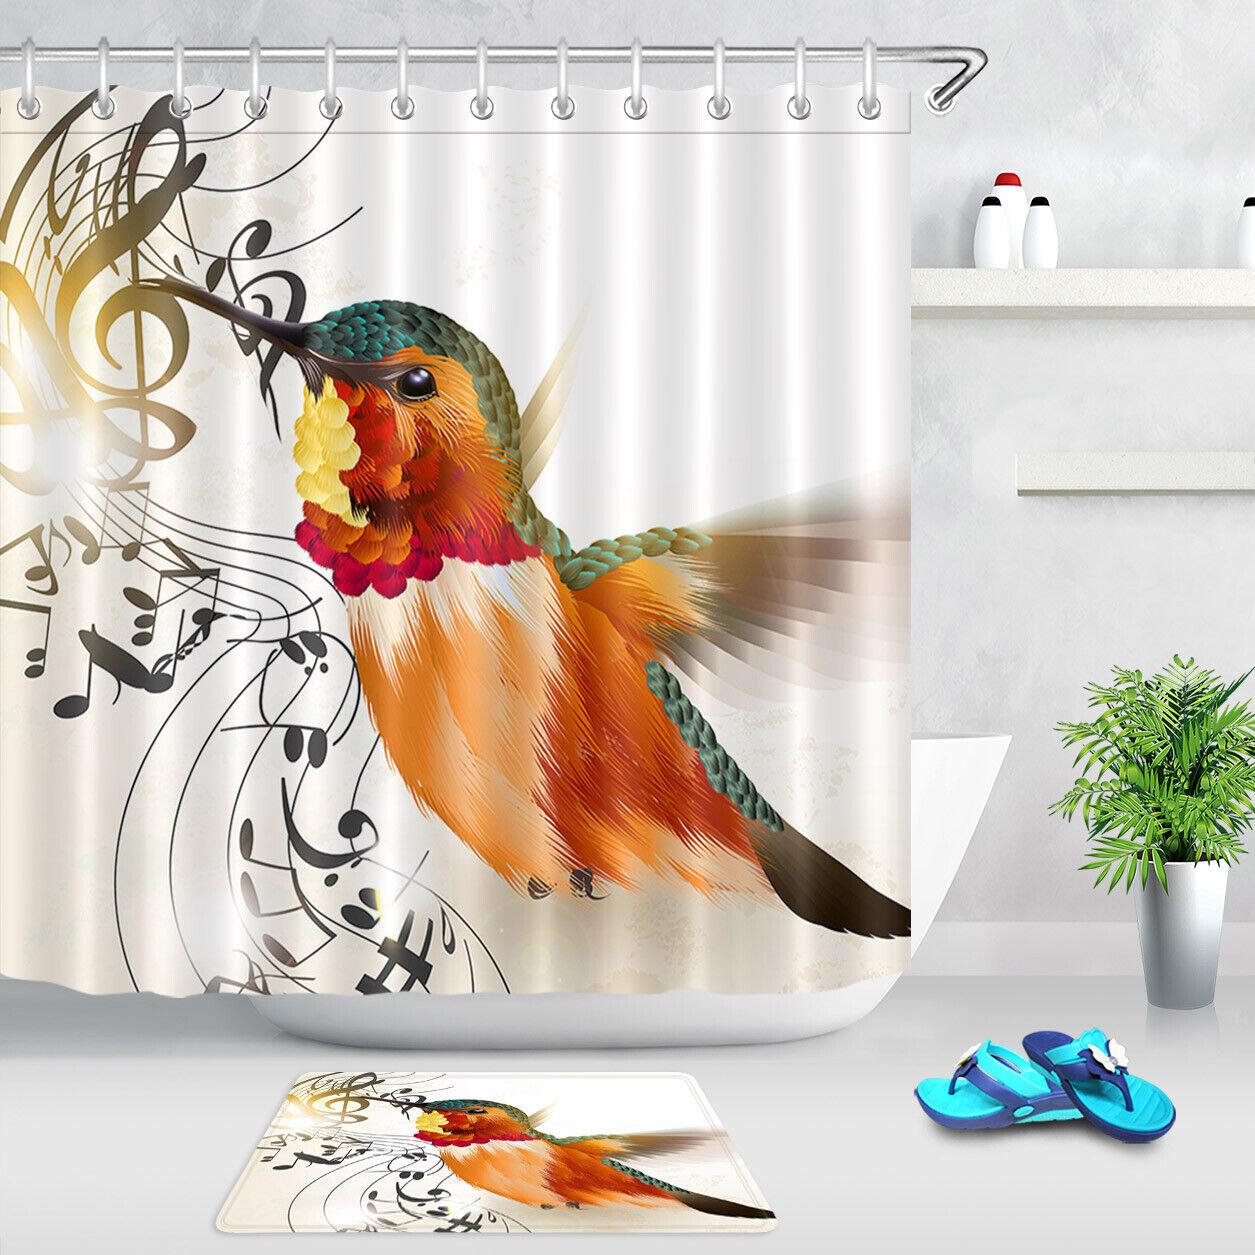 Shower Curtain Set Bathroom Fabric